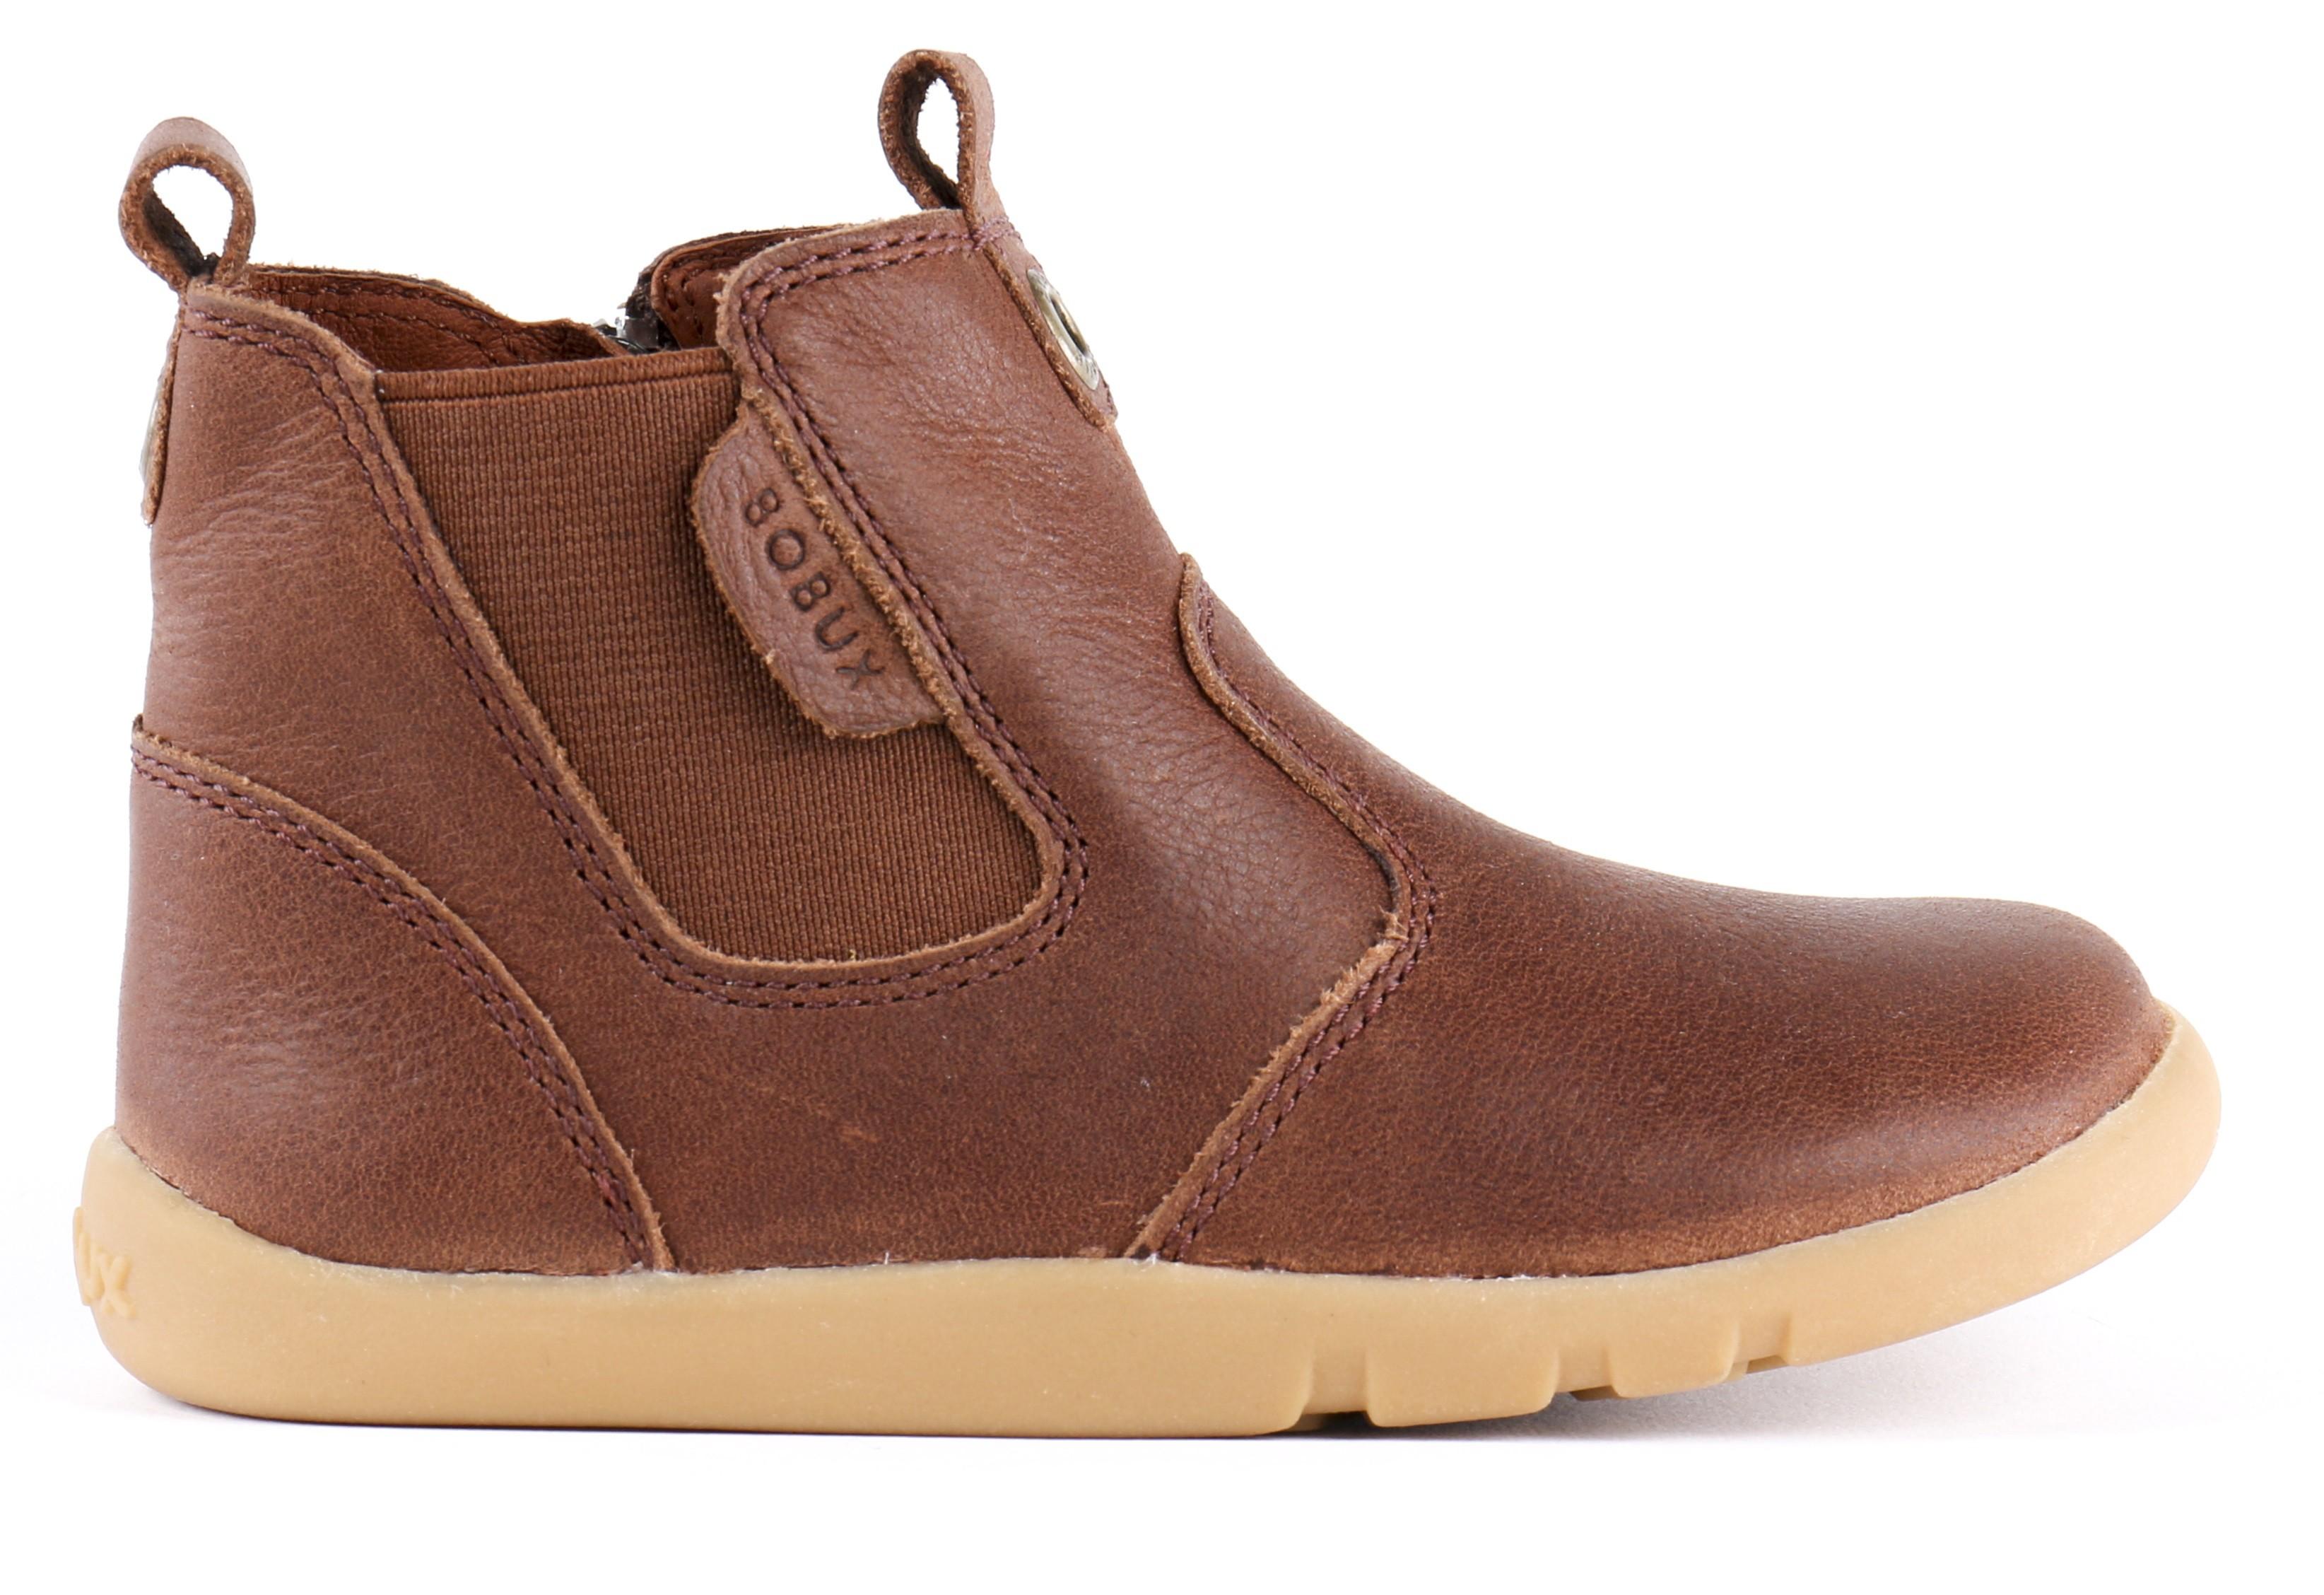 9e22a4315d0 Girls Boots - Shop By Style - Little Wanderers